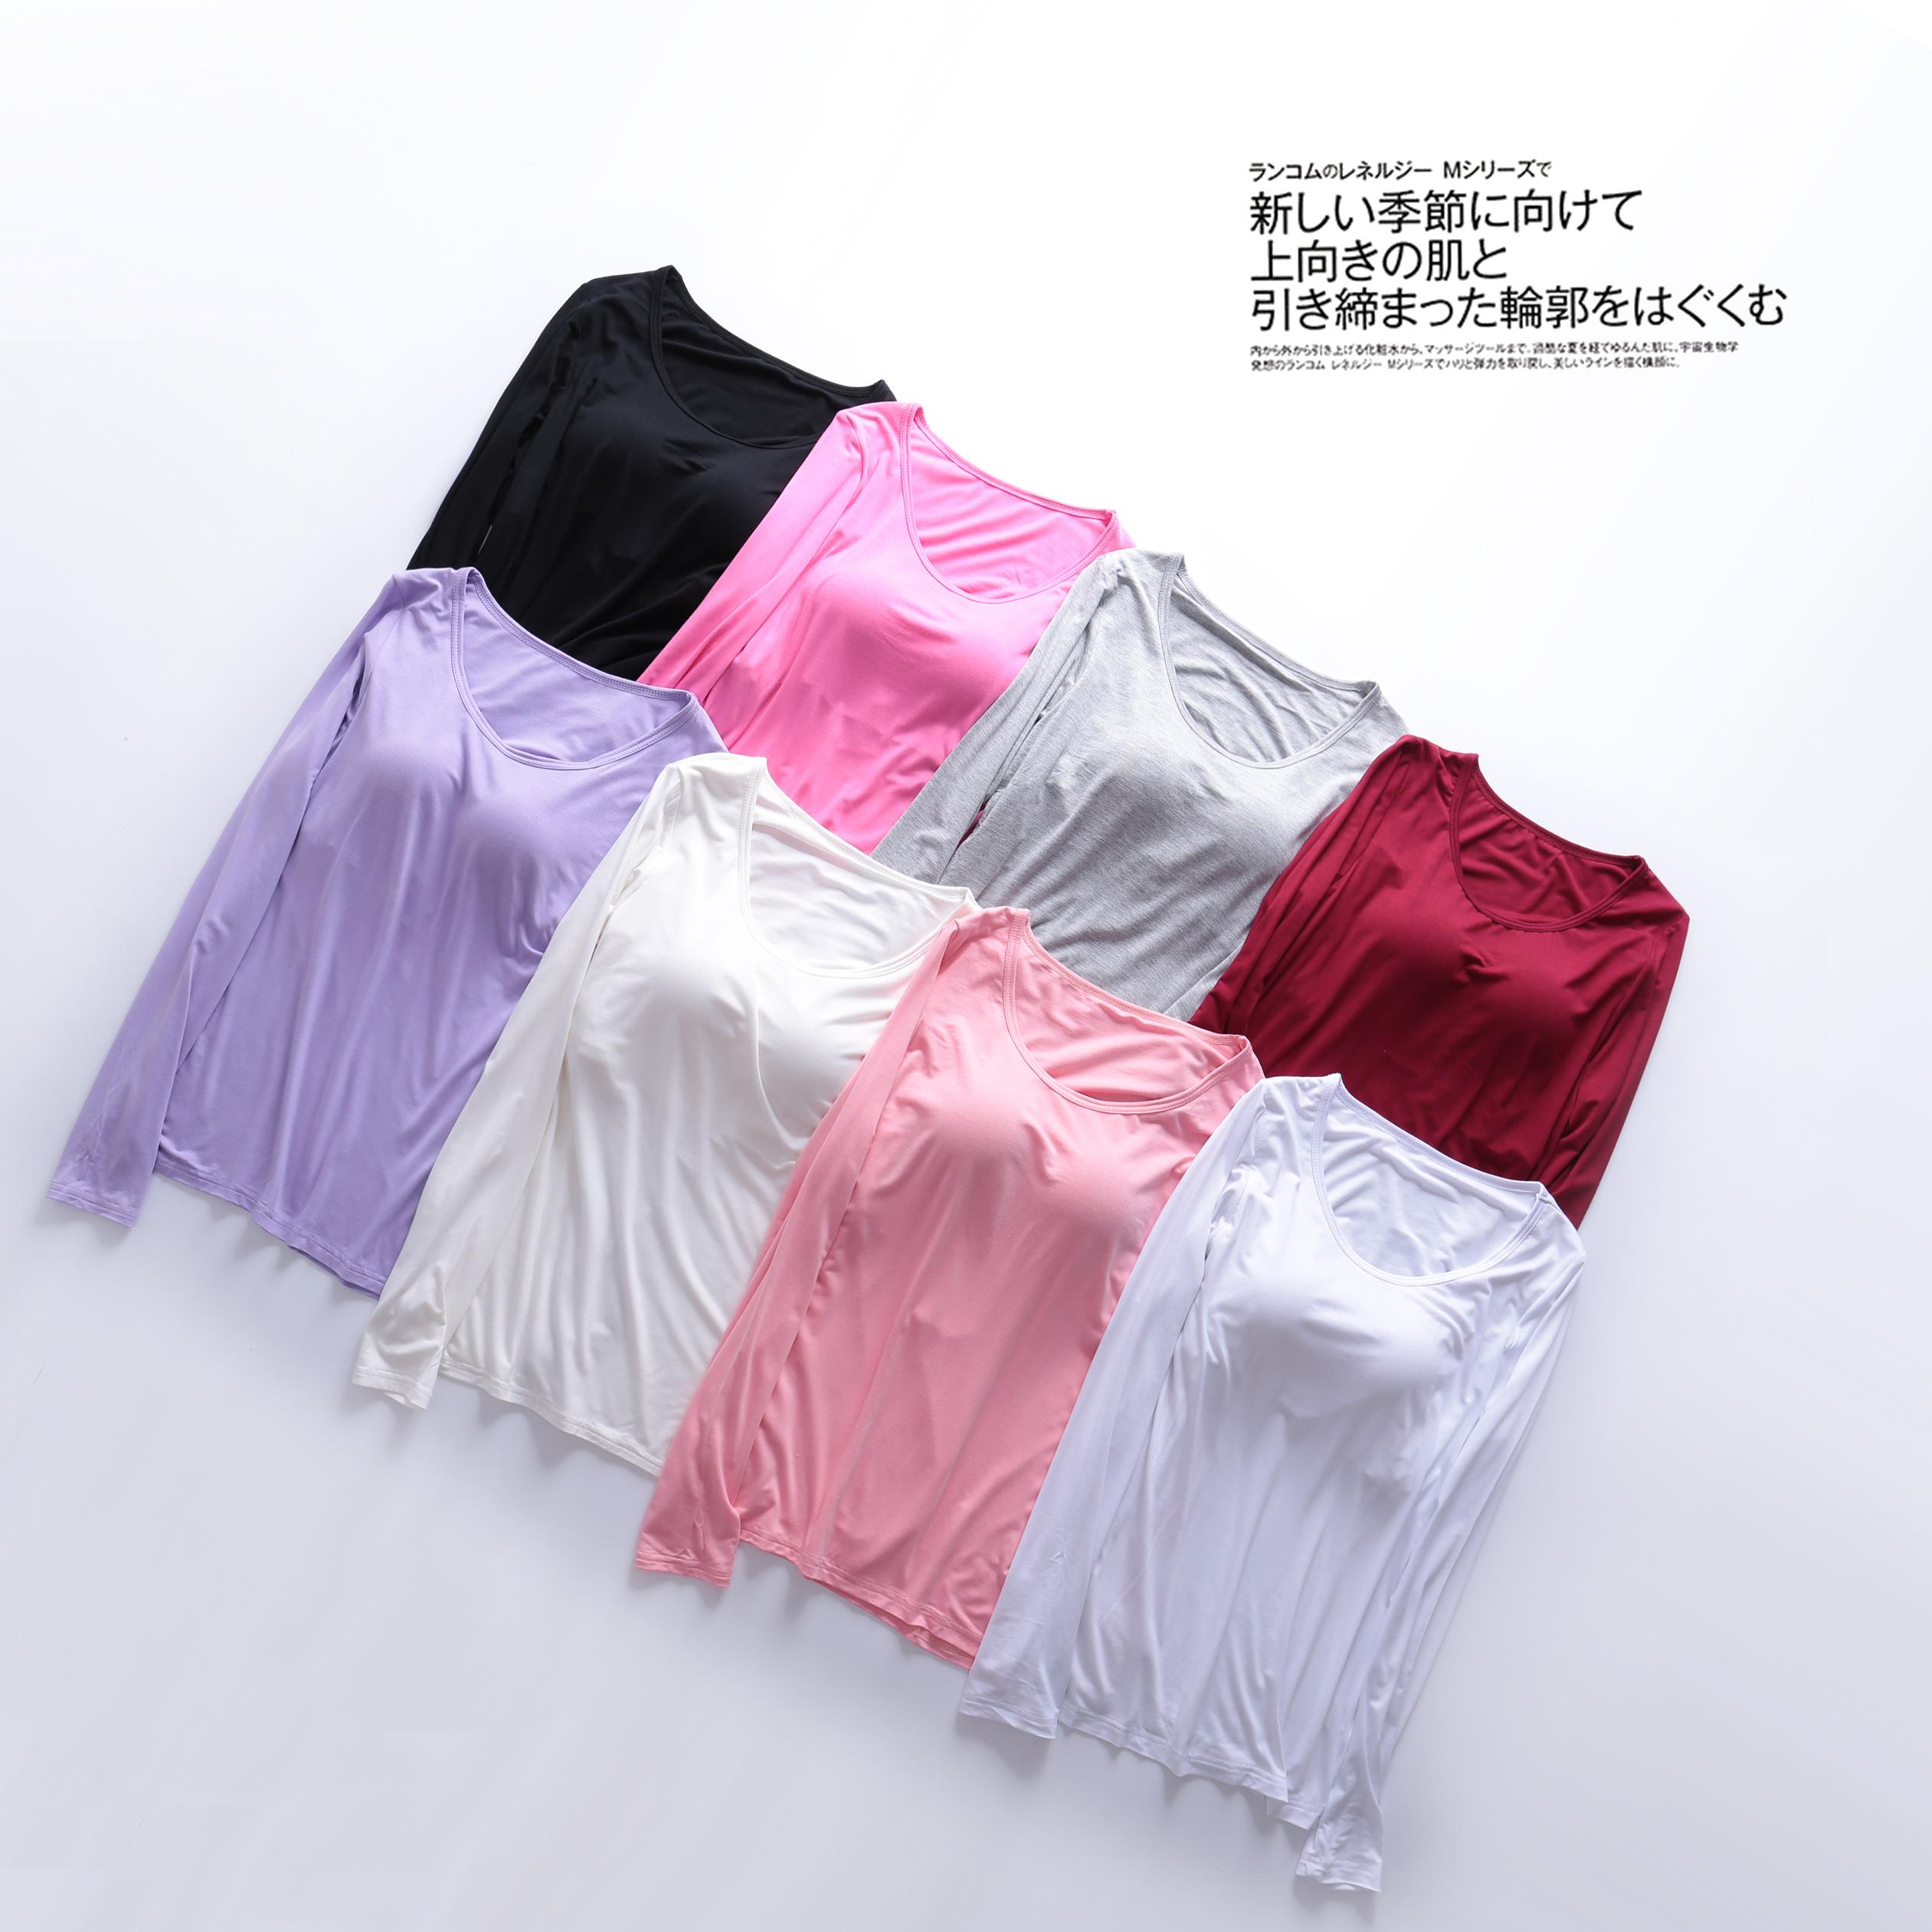 No bra with bra pad long sleeve T-shirt bra cup all in one yogimodal underclothing womens underwear autumn wear